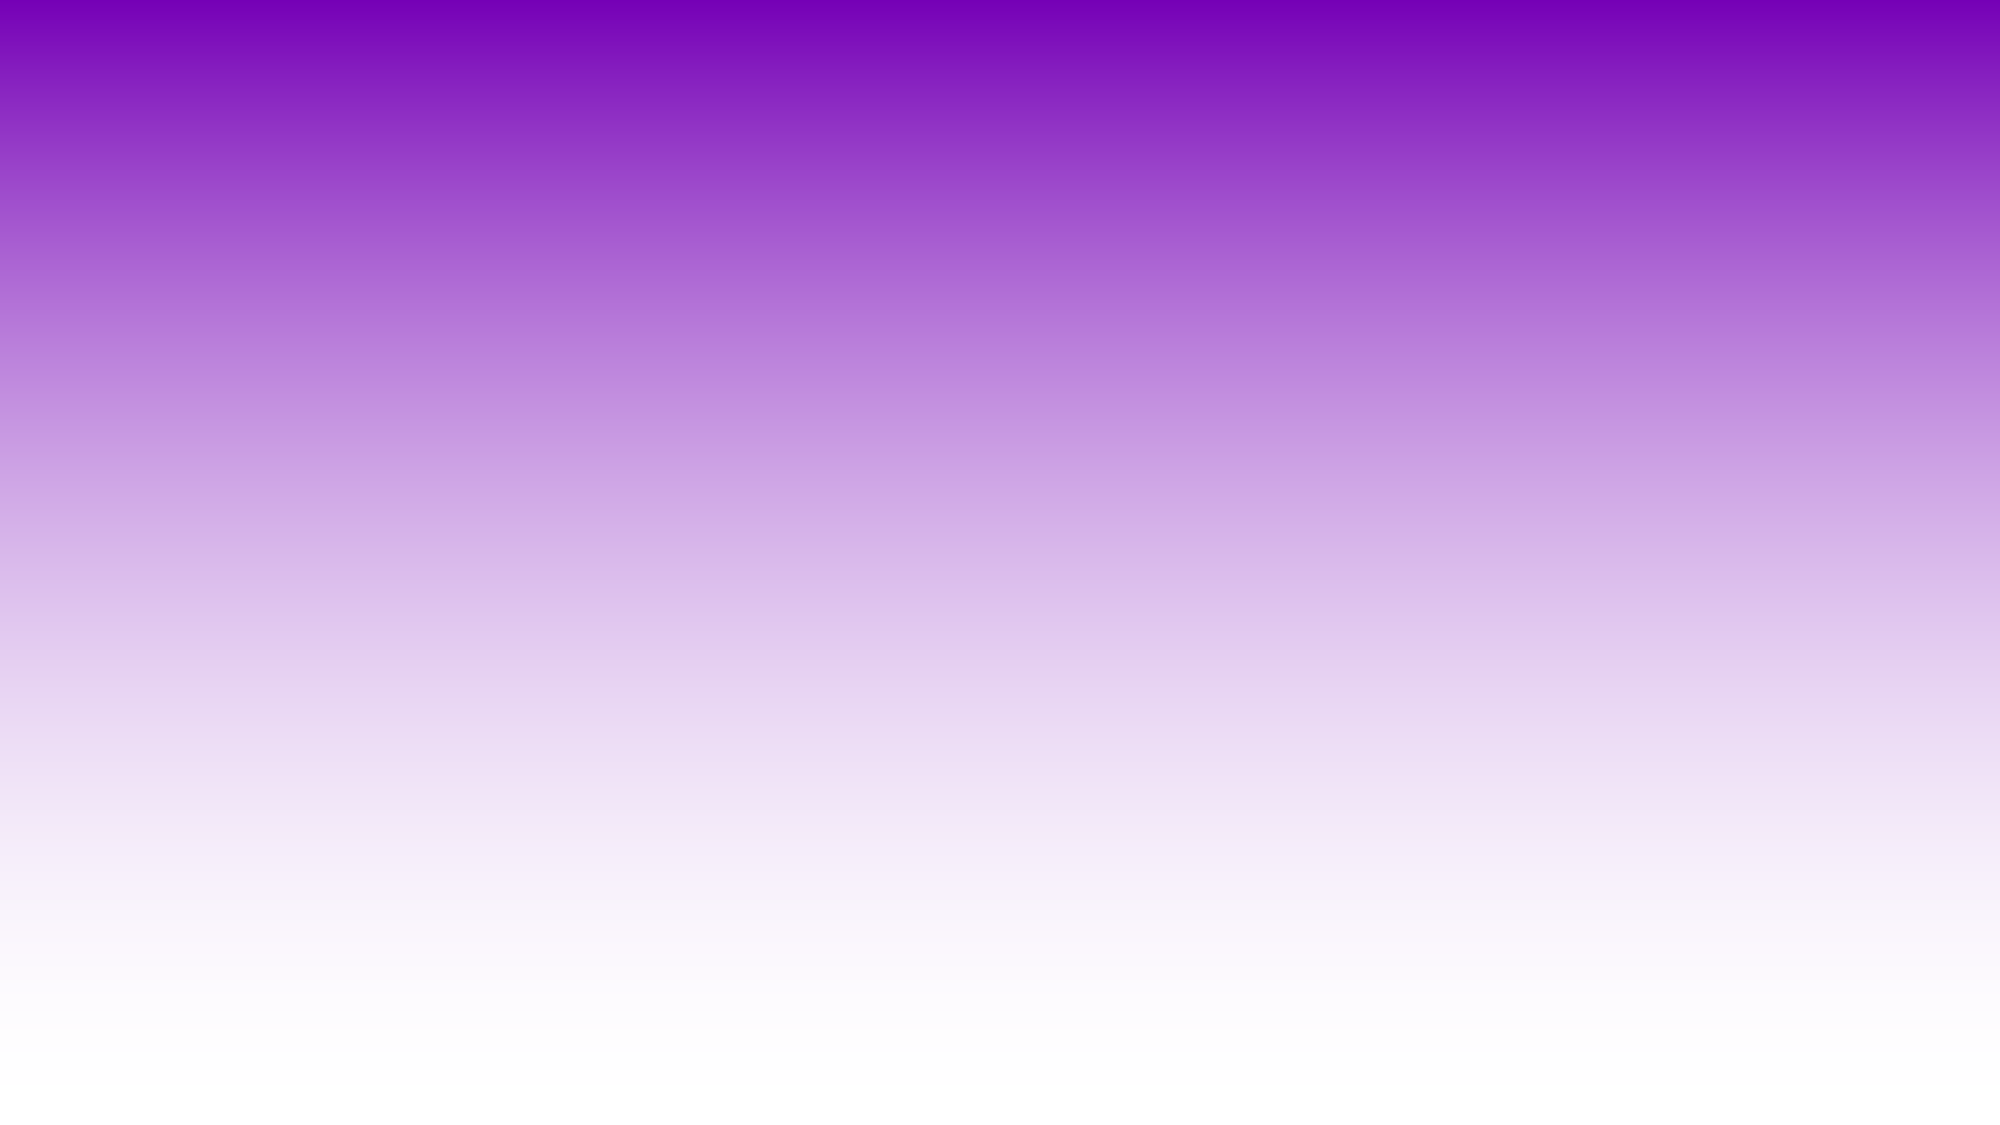 purple gradient top down.png